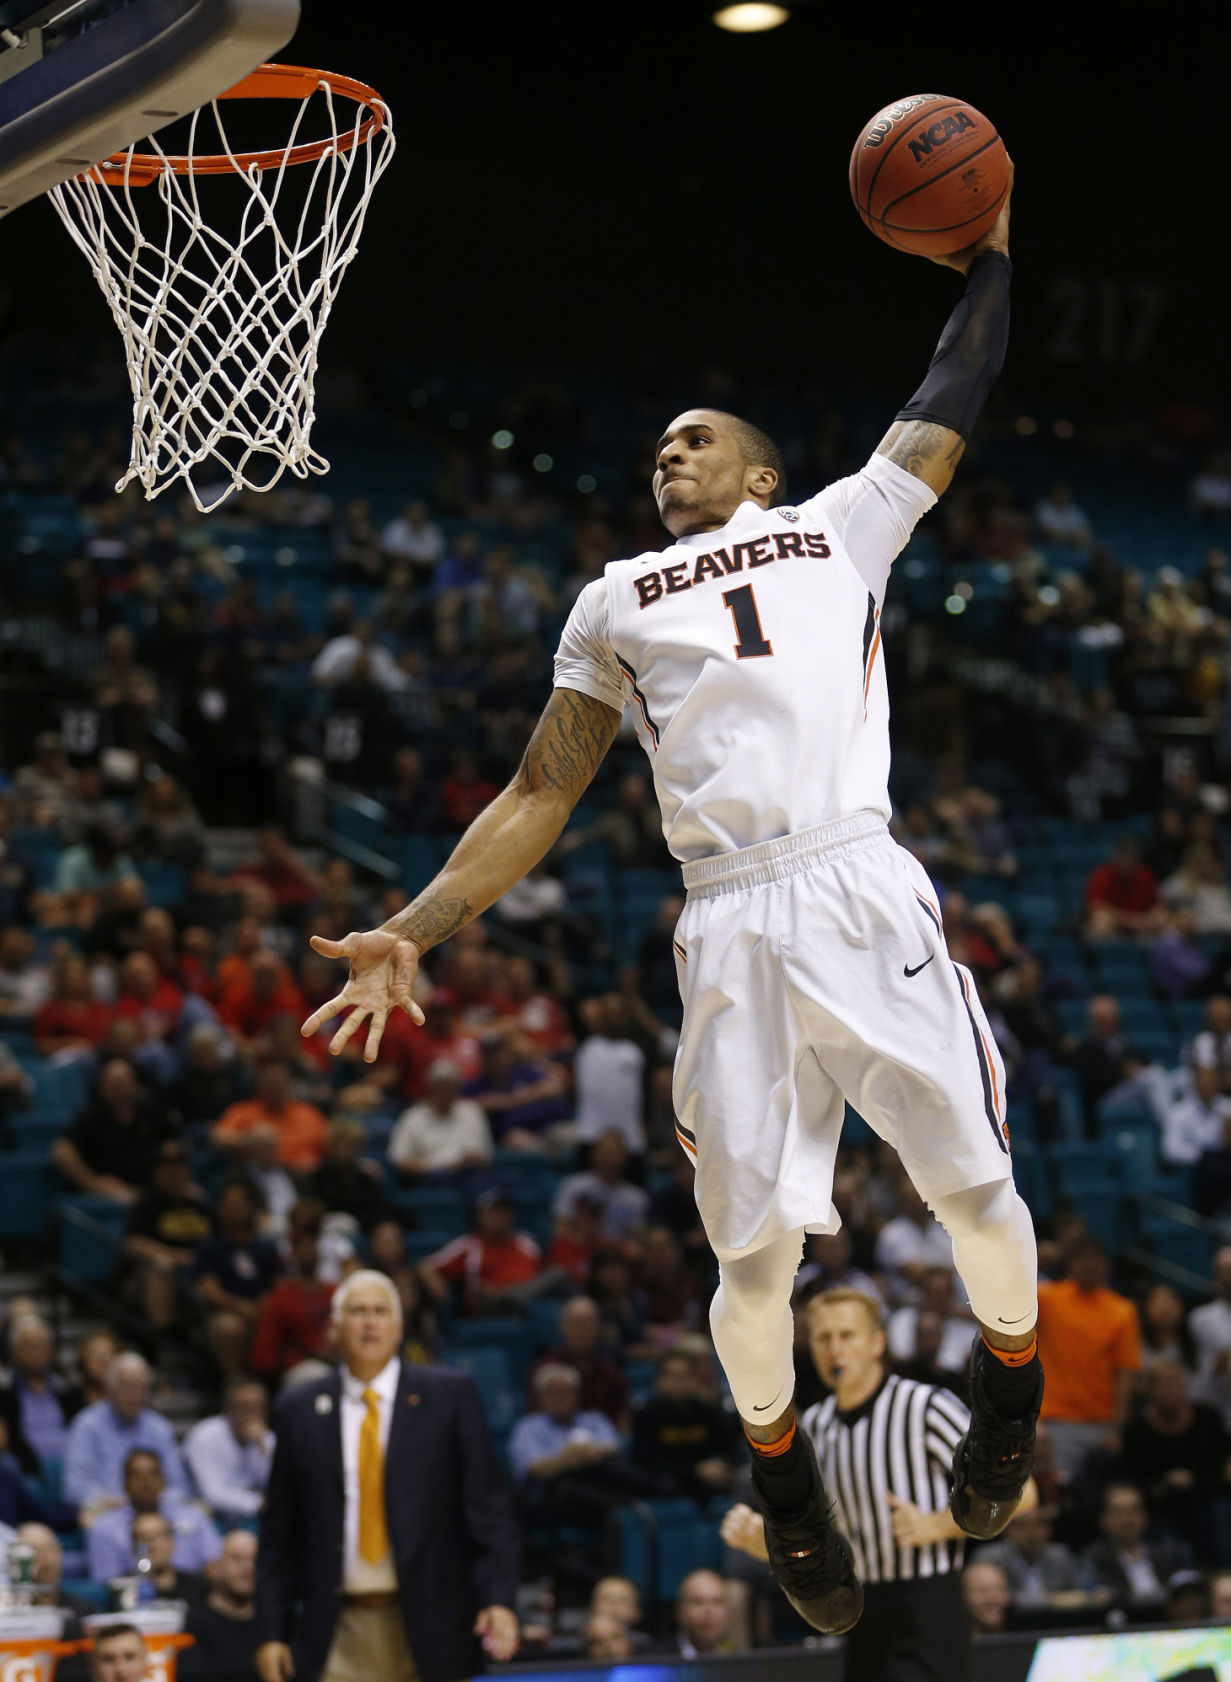 OSU menu0027s basketball Beavers strengthen NCAA tournament